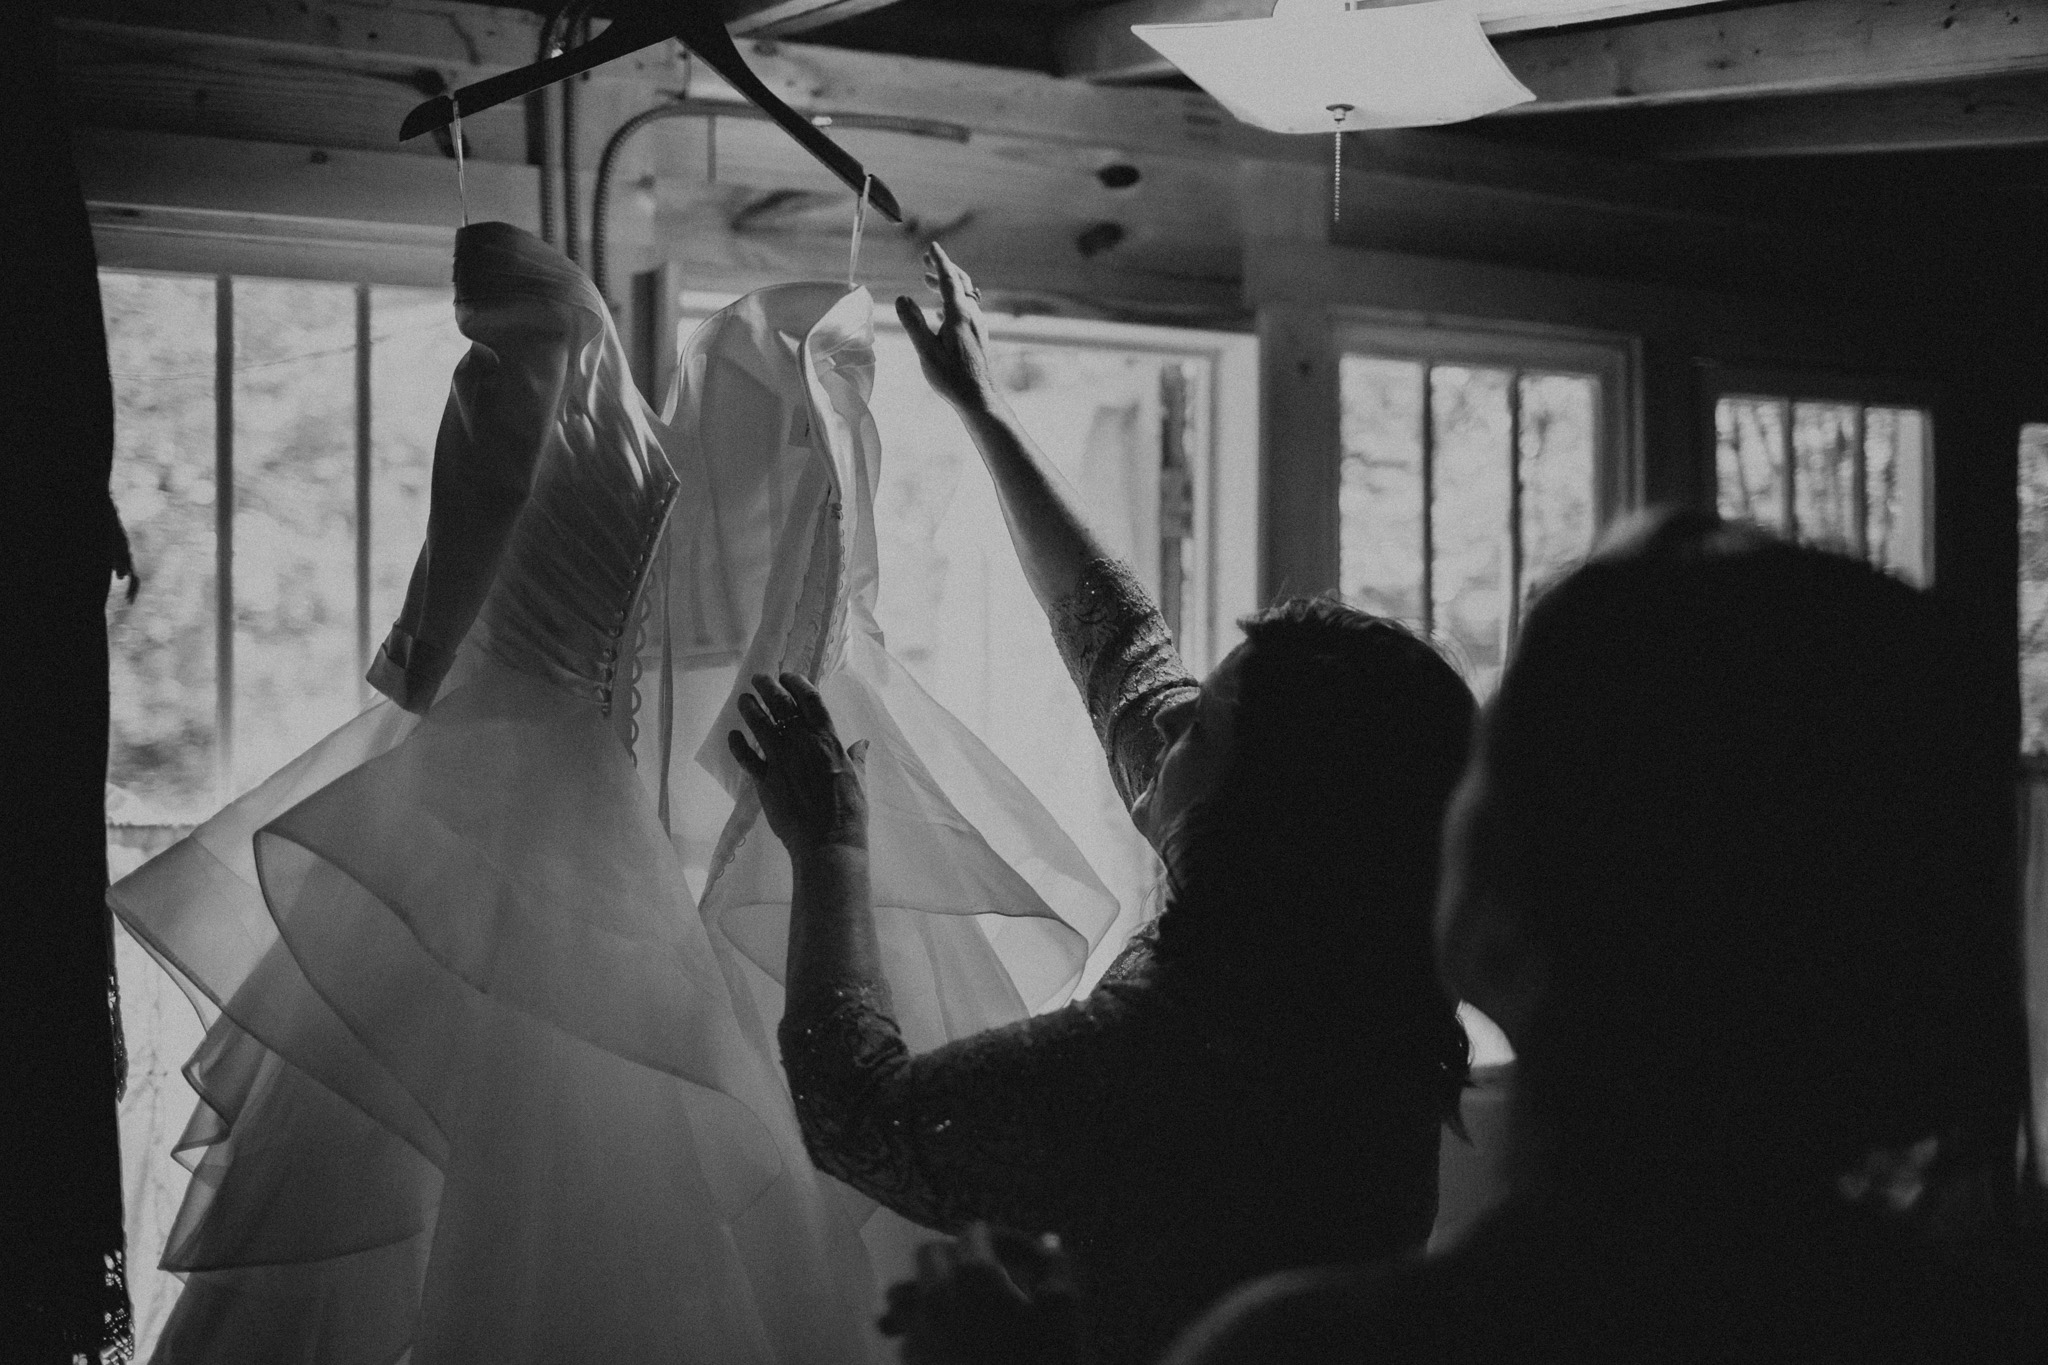 MillCreek-Wilde-Wedding-Barn-Michigan-Eliza-Eric-Vafa-Photo167.jpg